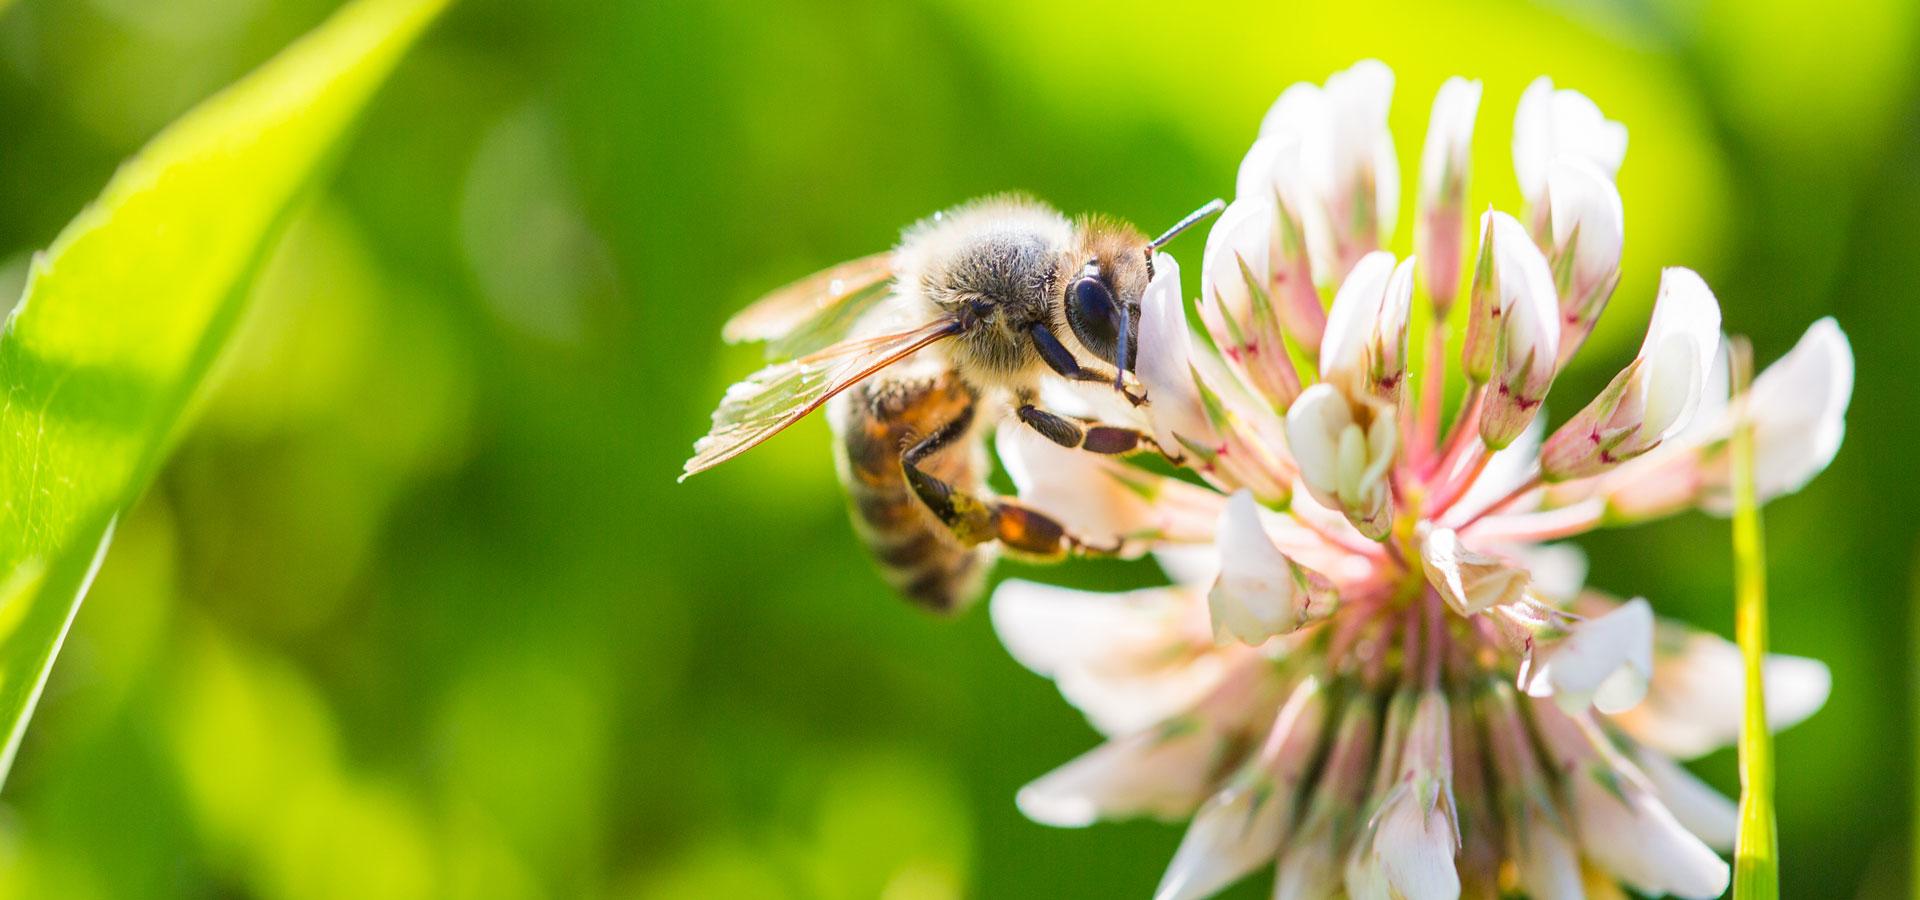 آموزش گام به گام پرورش زنبور عسل